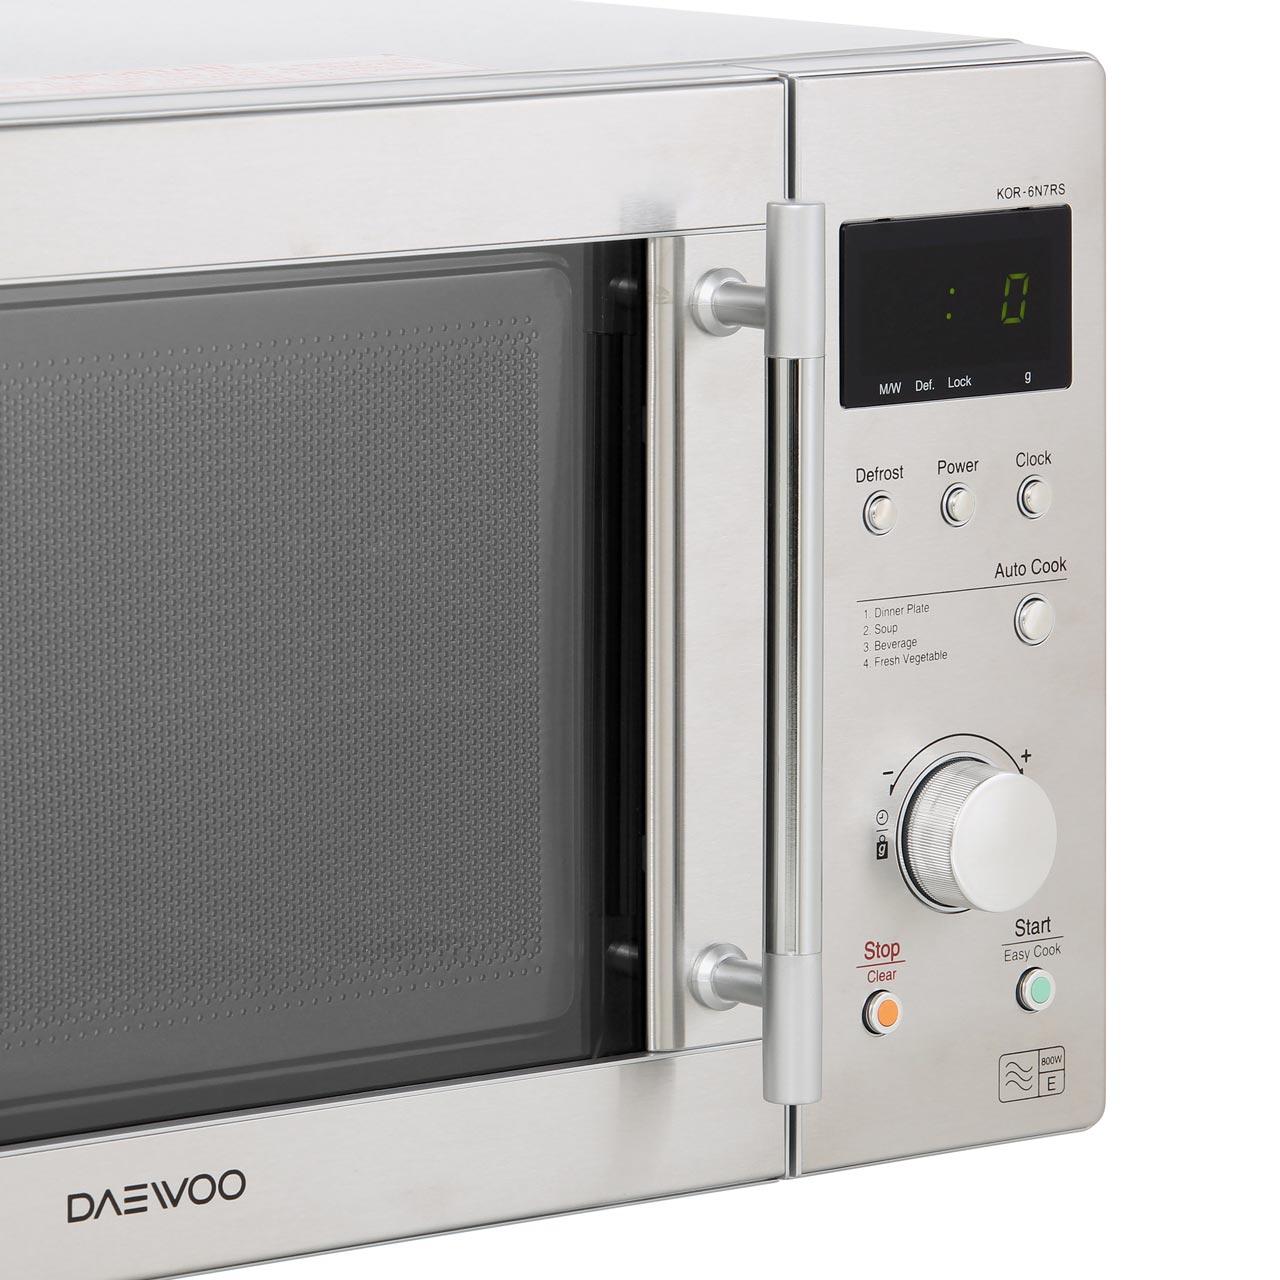 Daewoo KOR6N7RS 800 Watt Microwave Free Standing Silver New from AO